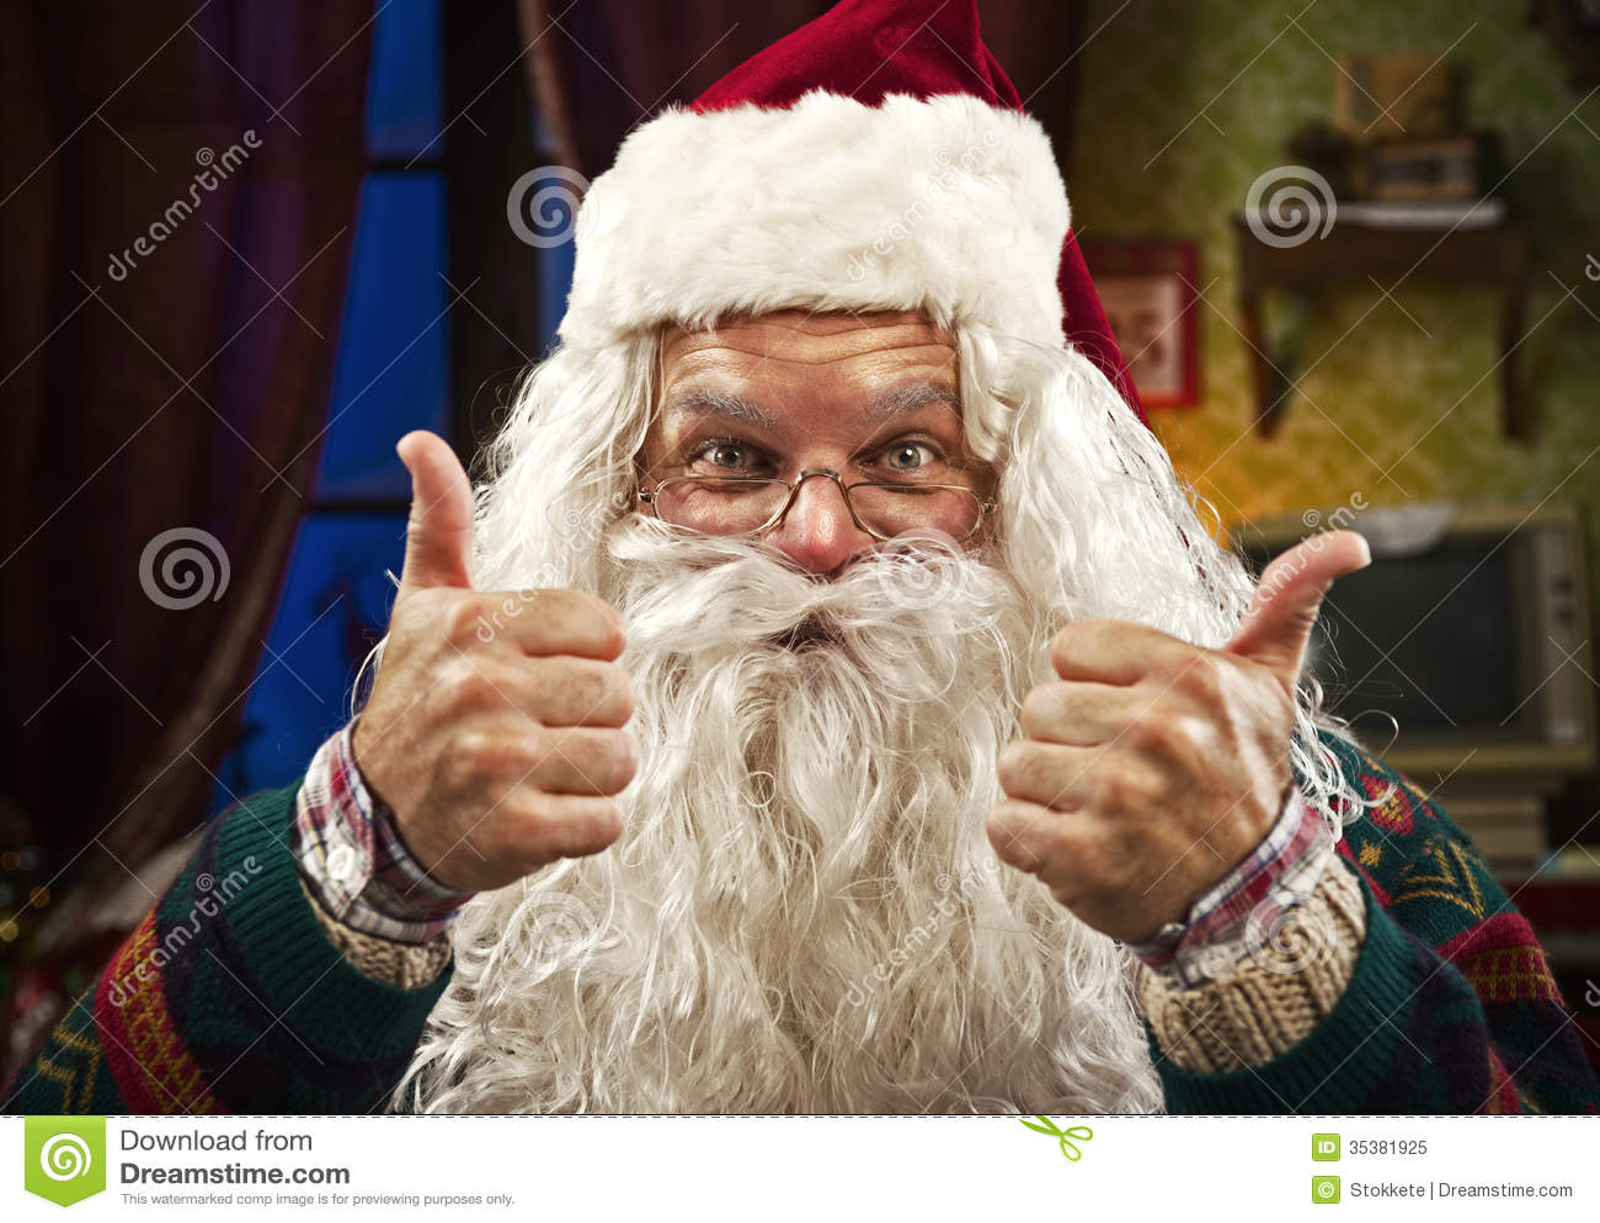 Santa Claus Royalty Free Stock Photo  Image 35381925